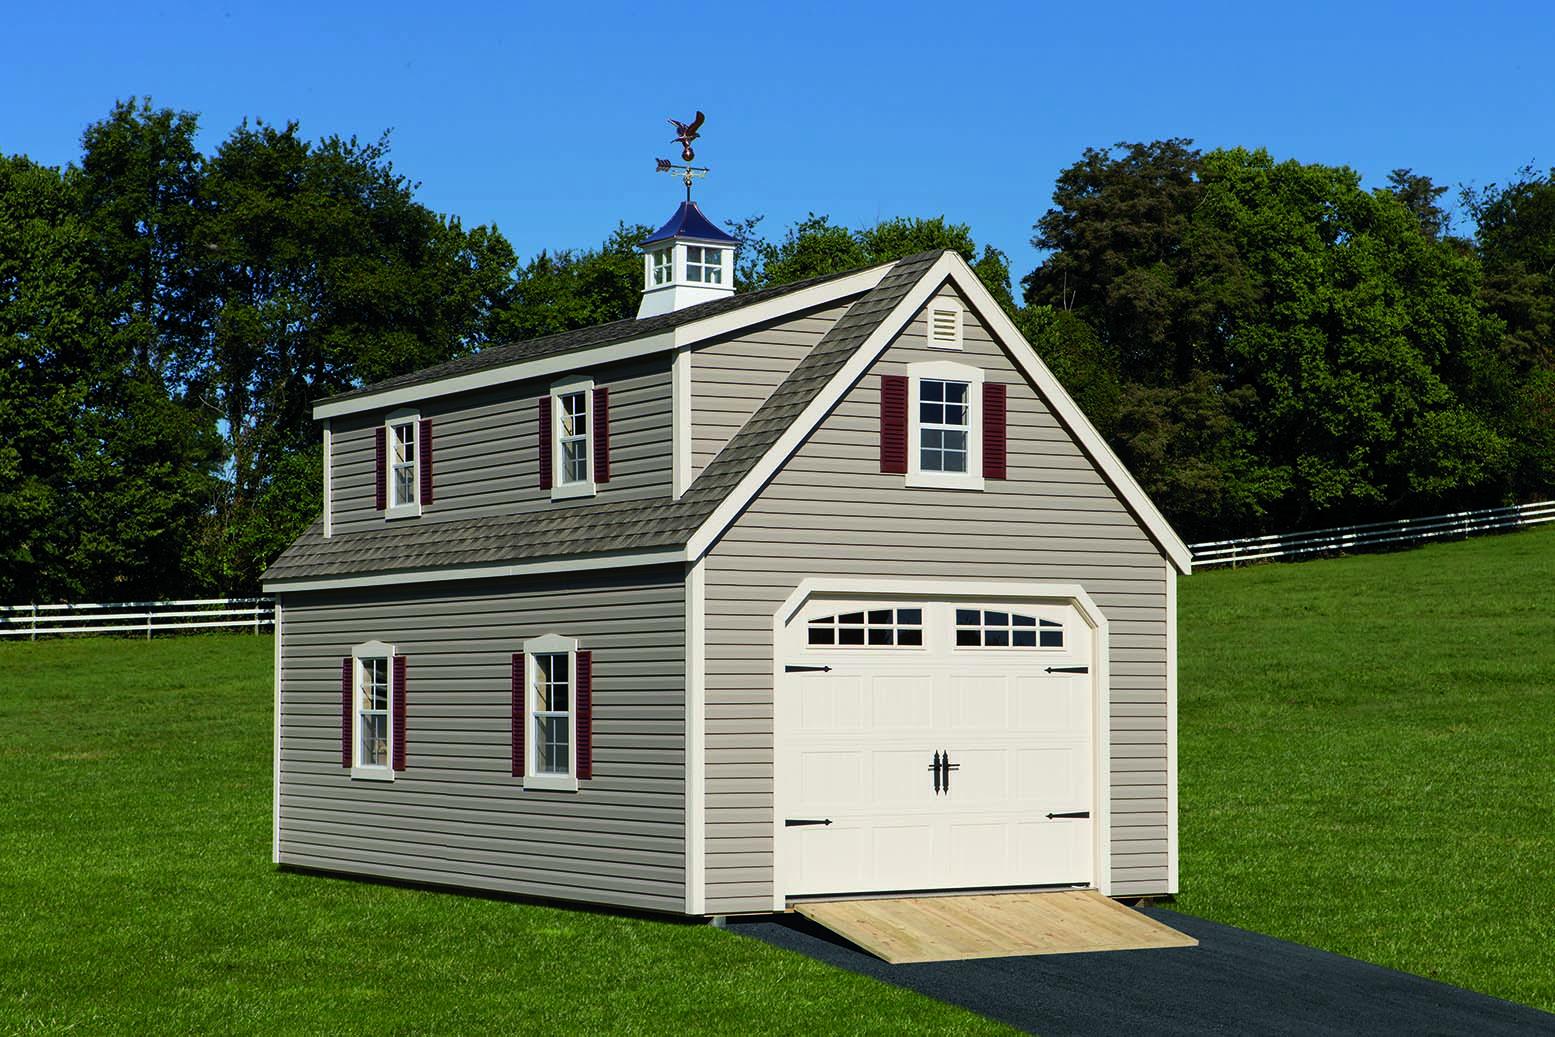 Sheds barns garages pine ridge barns for Shed with dormer